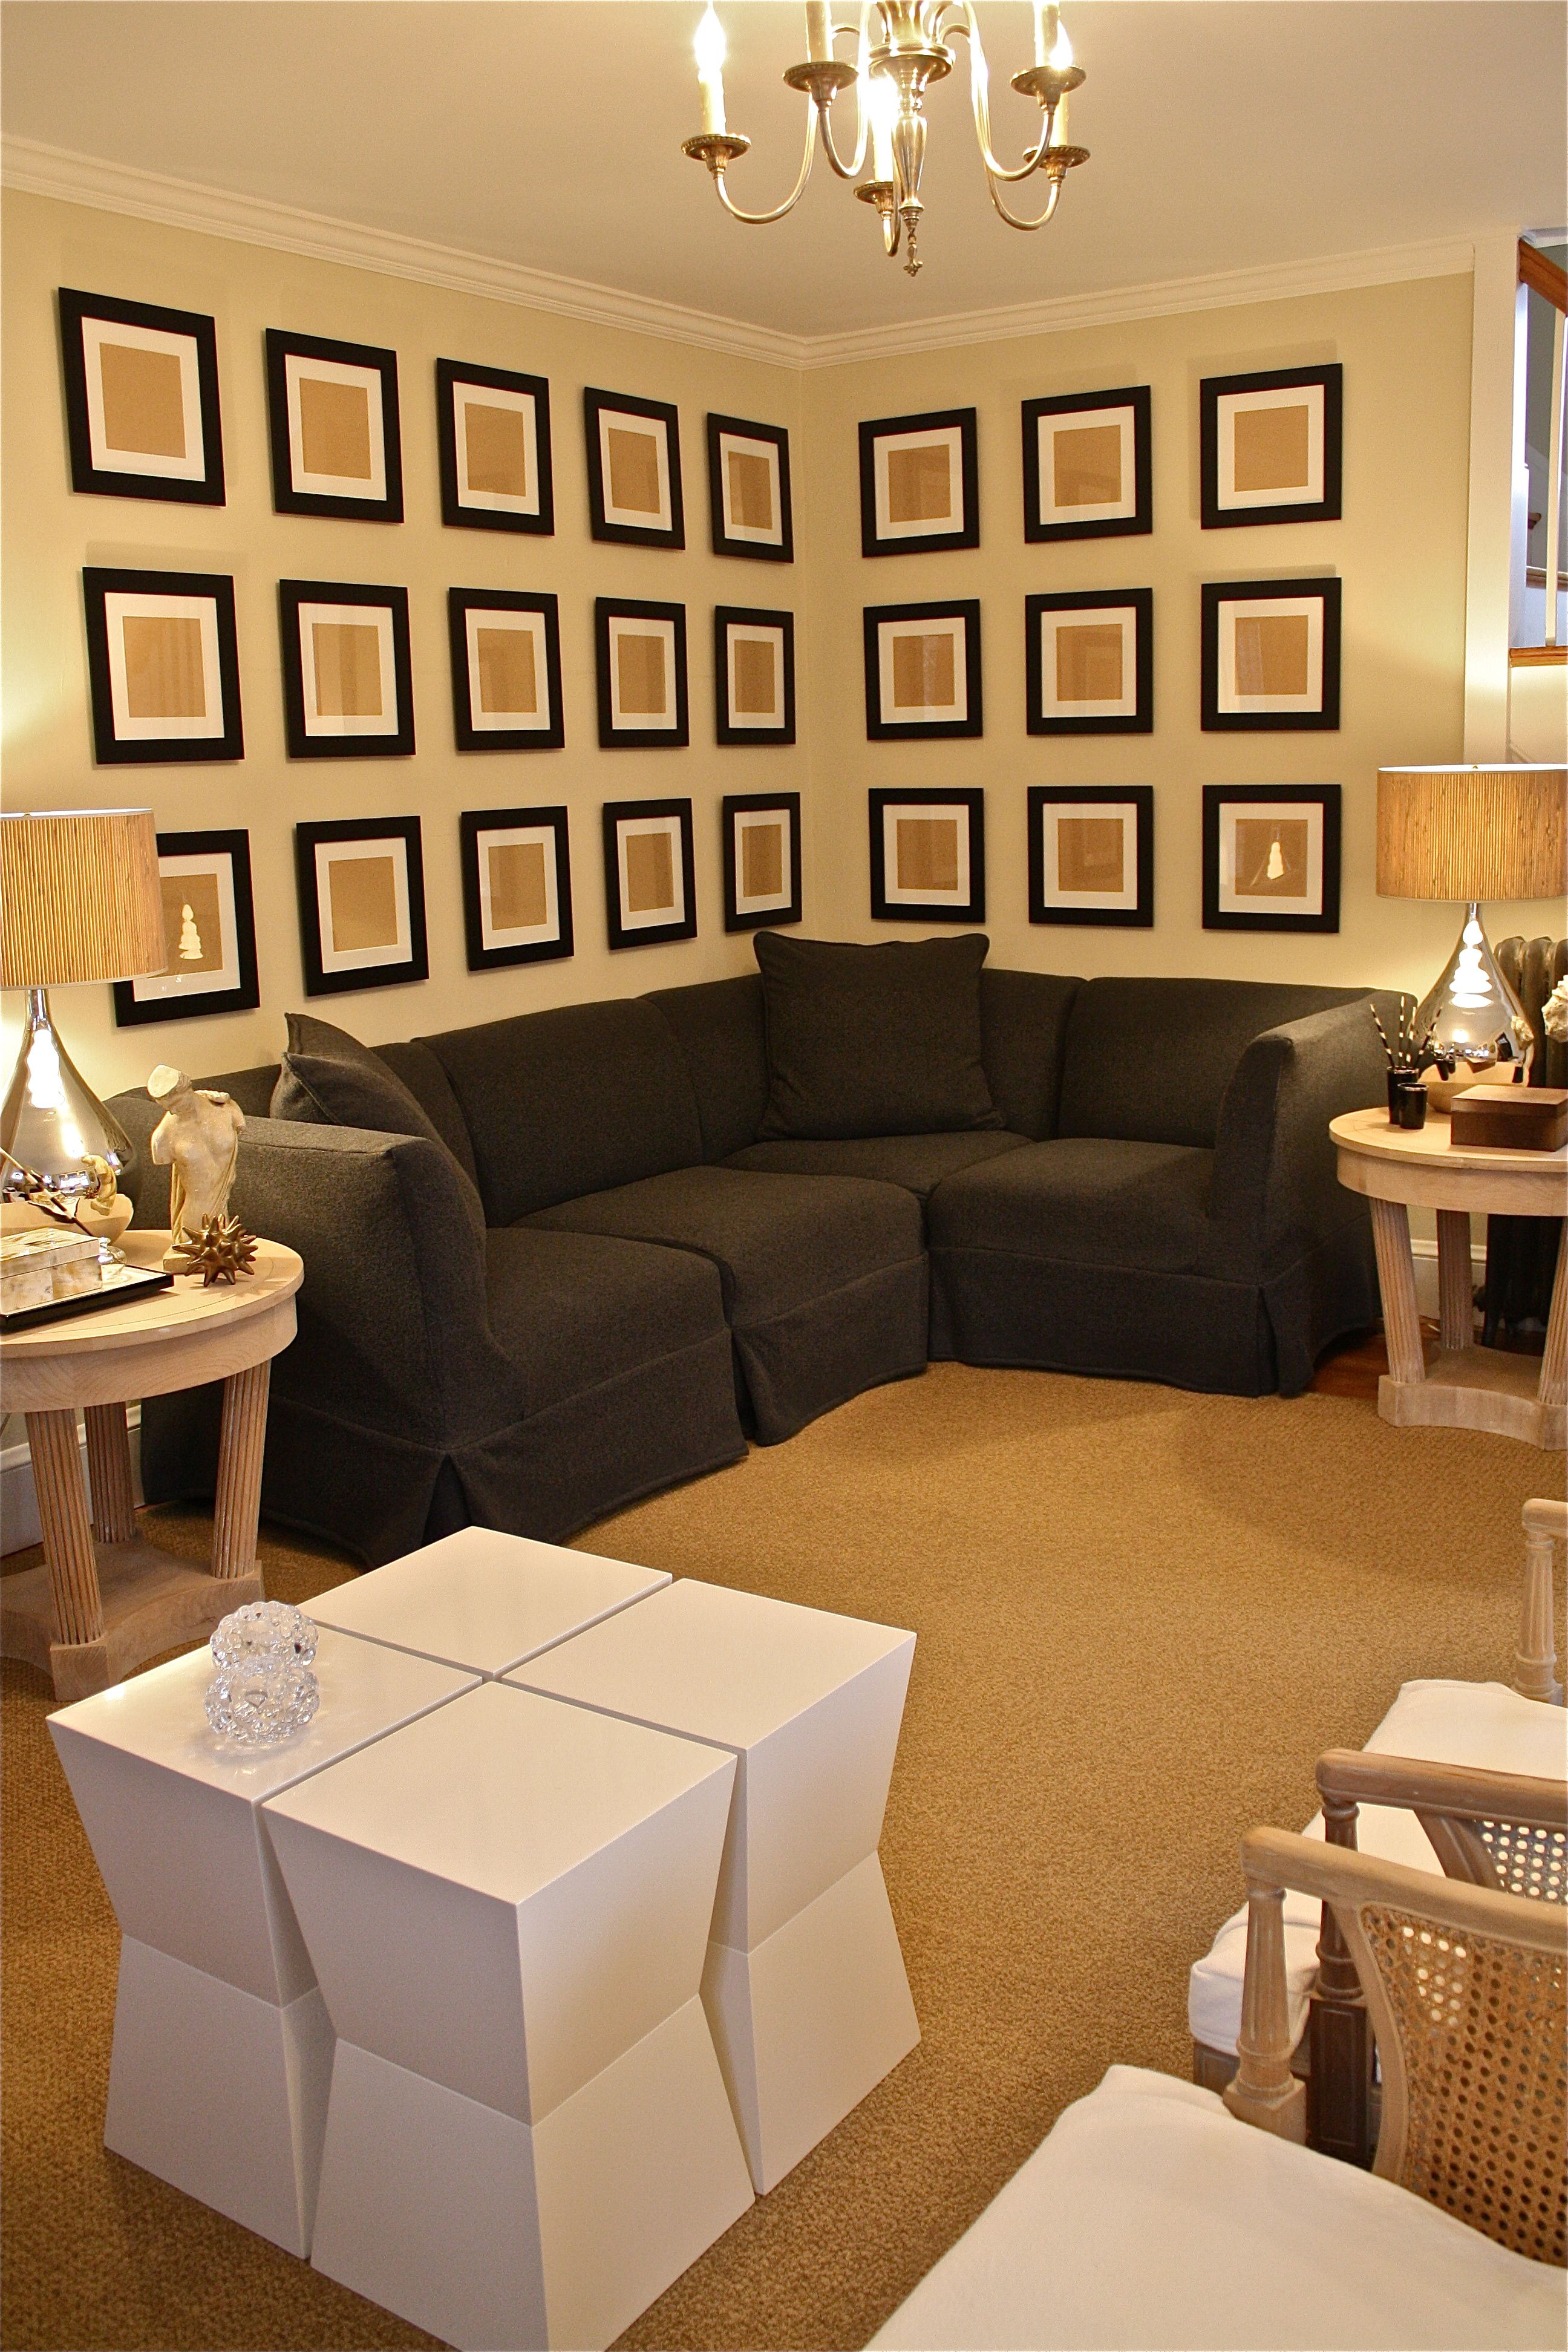 CS Dark gray sofa that looks good